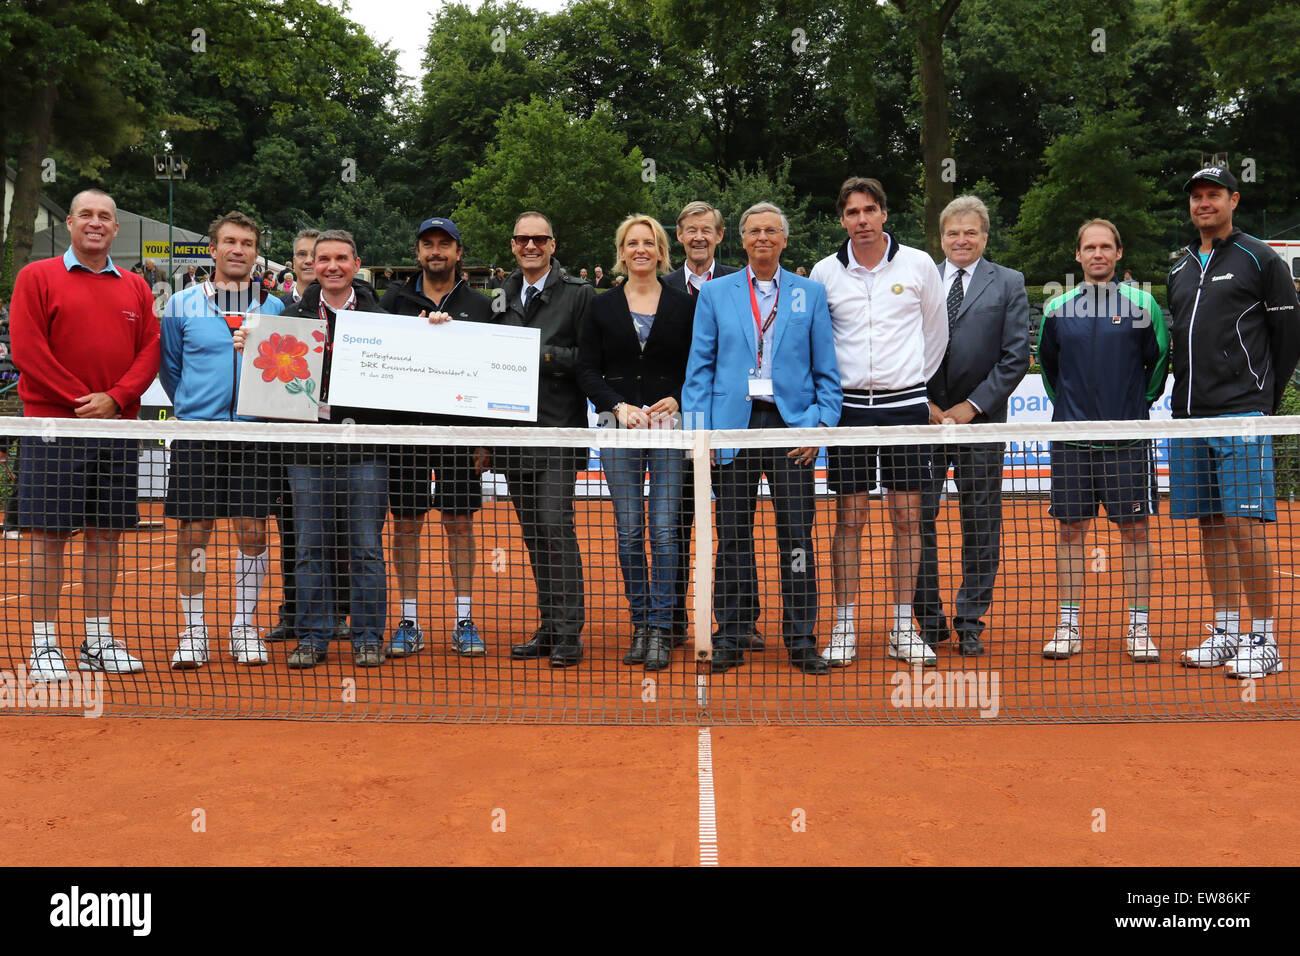 19.06.2015. Düsseldorf, Germany. DRK Charity Cup Tennis tournament. Opening Ceremony - Organisers, Sponsor - Stock Image